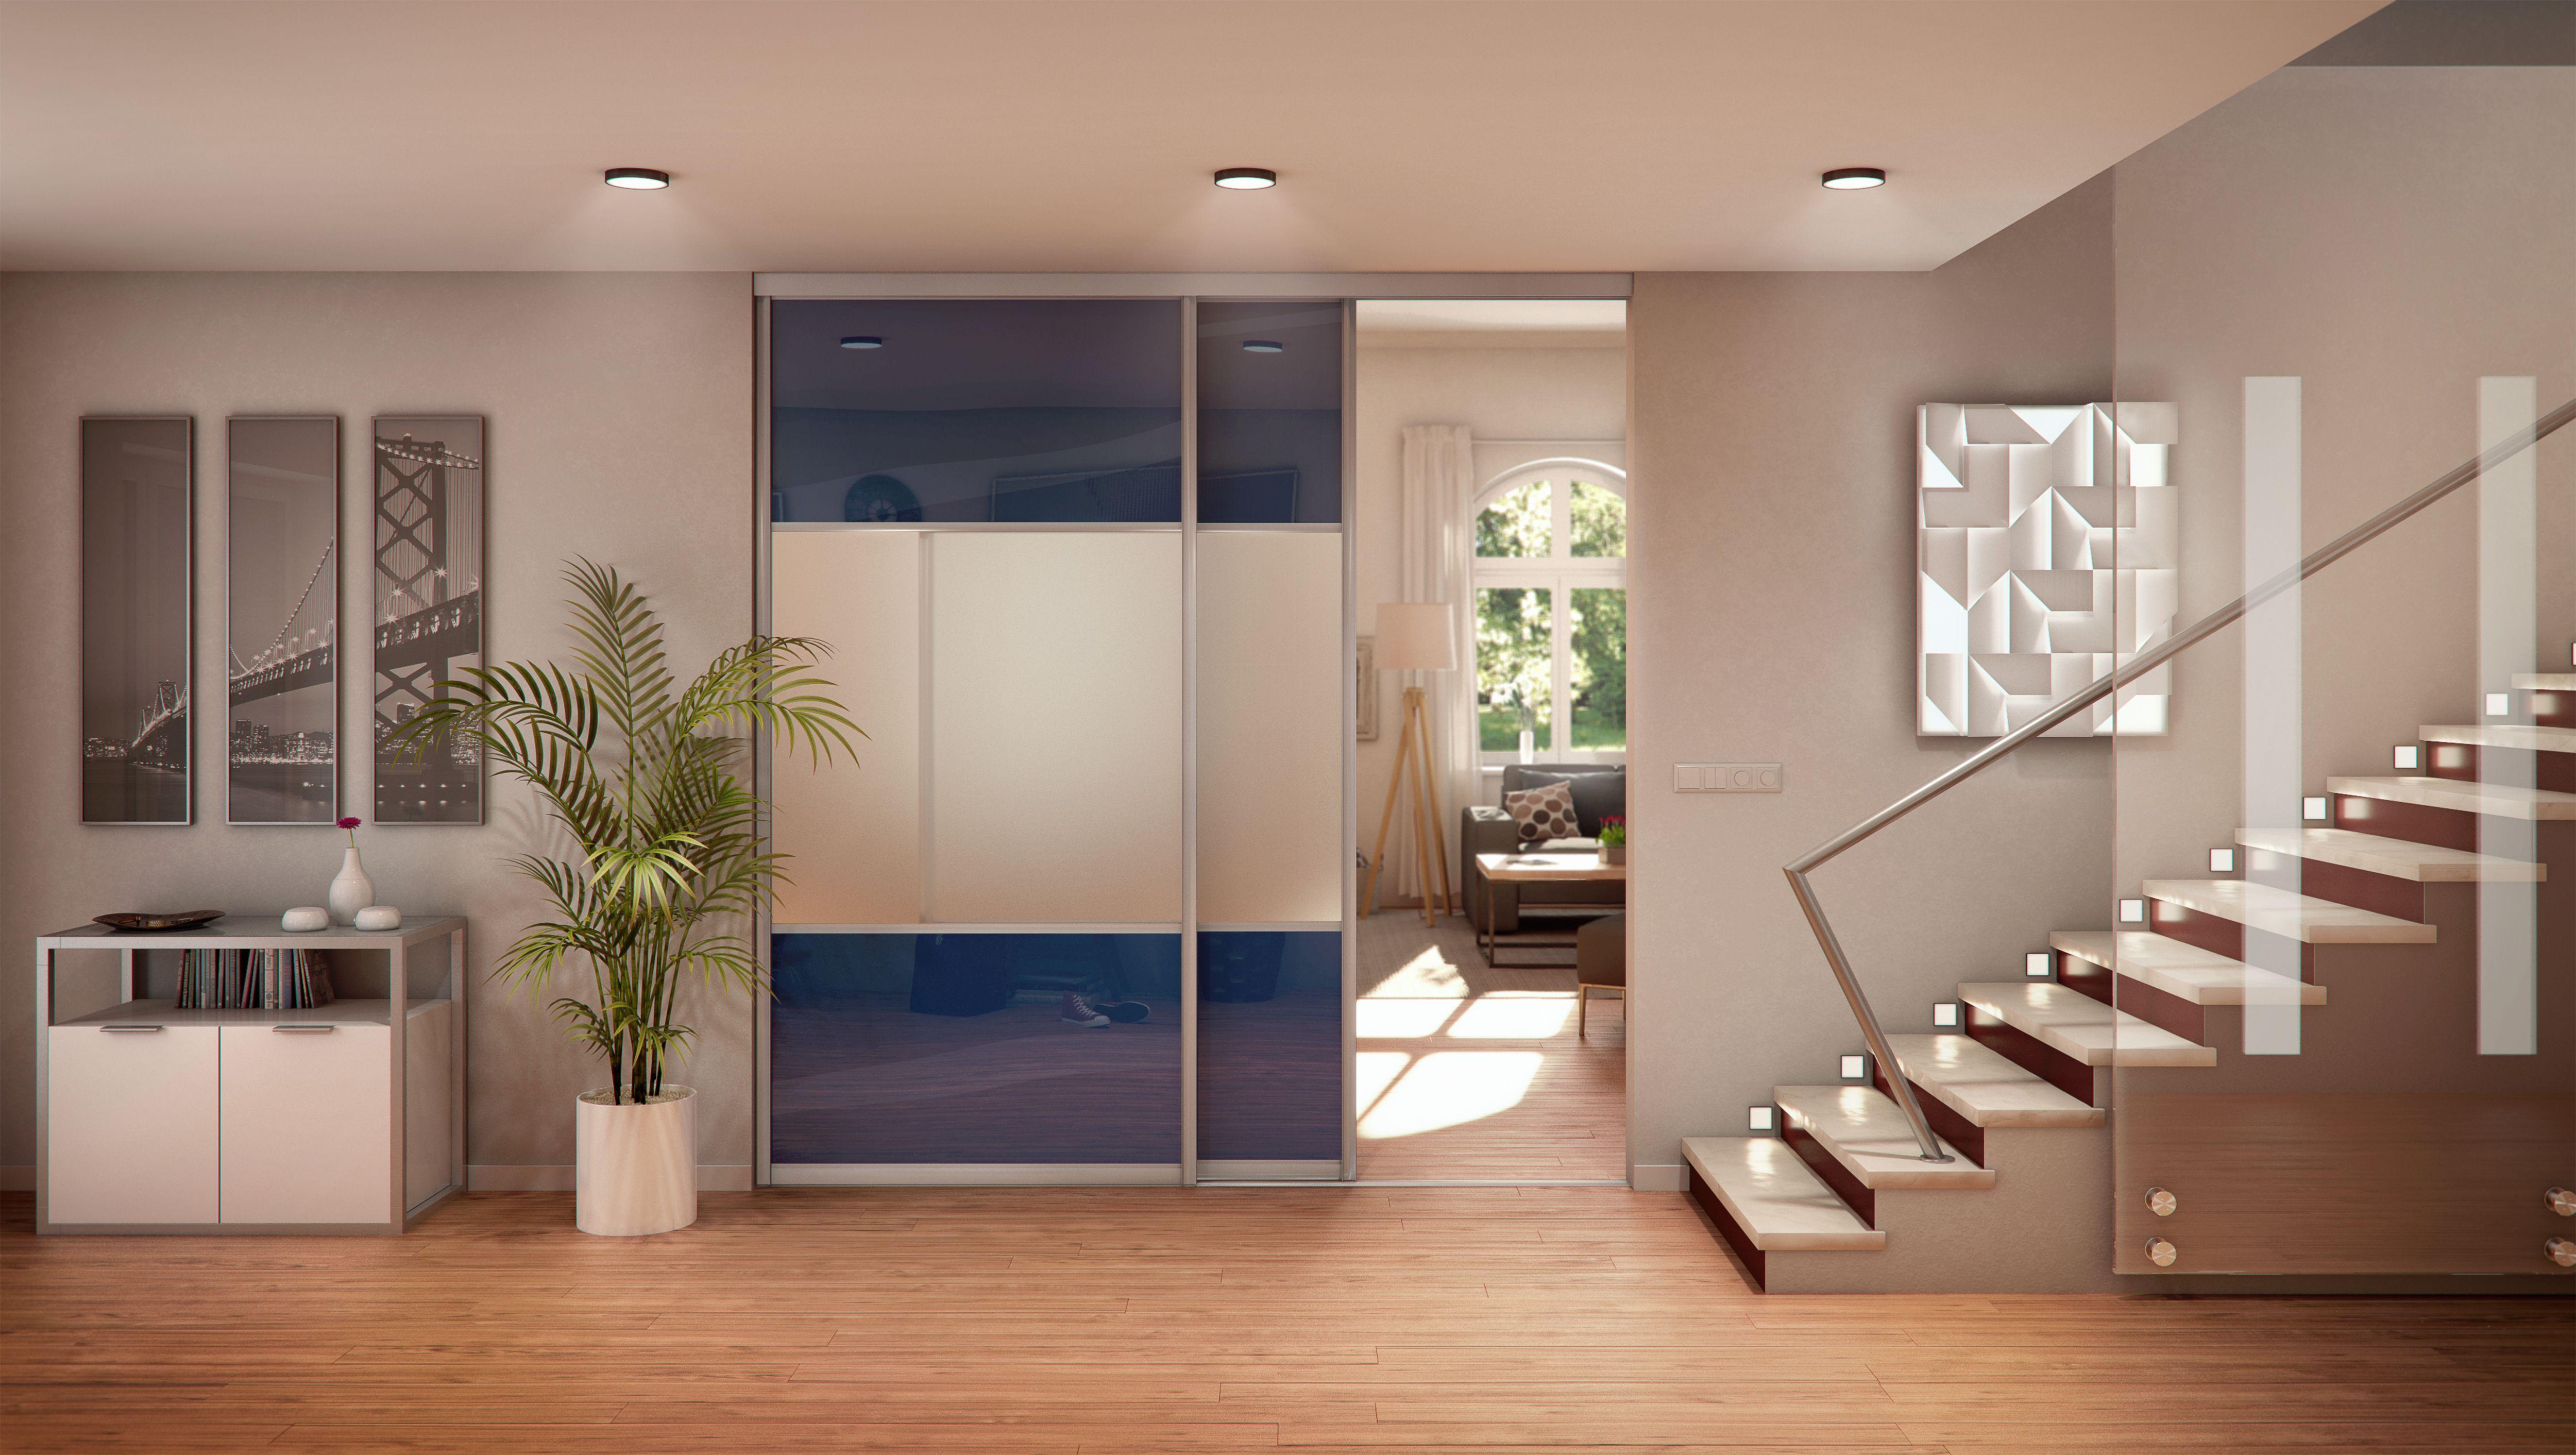 Inova Schiebetren Beautiful Schiebetr Badezimmer Dicht Unique Herrlich Schiebetr Badezimmer